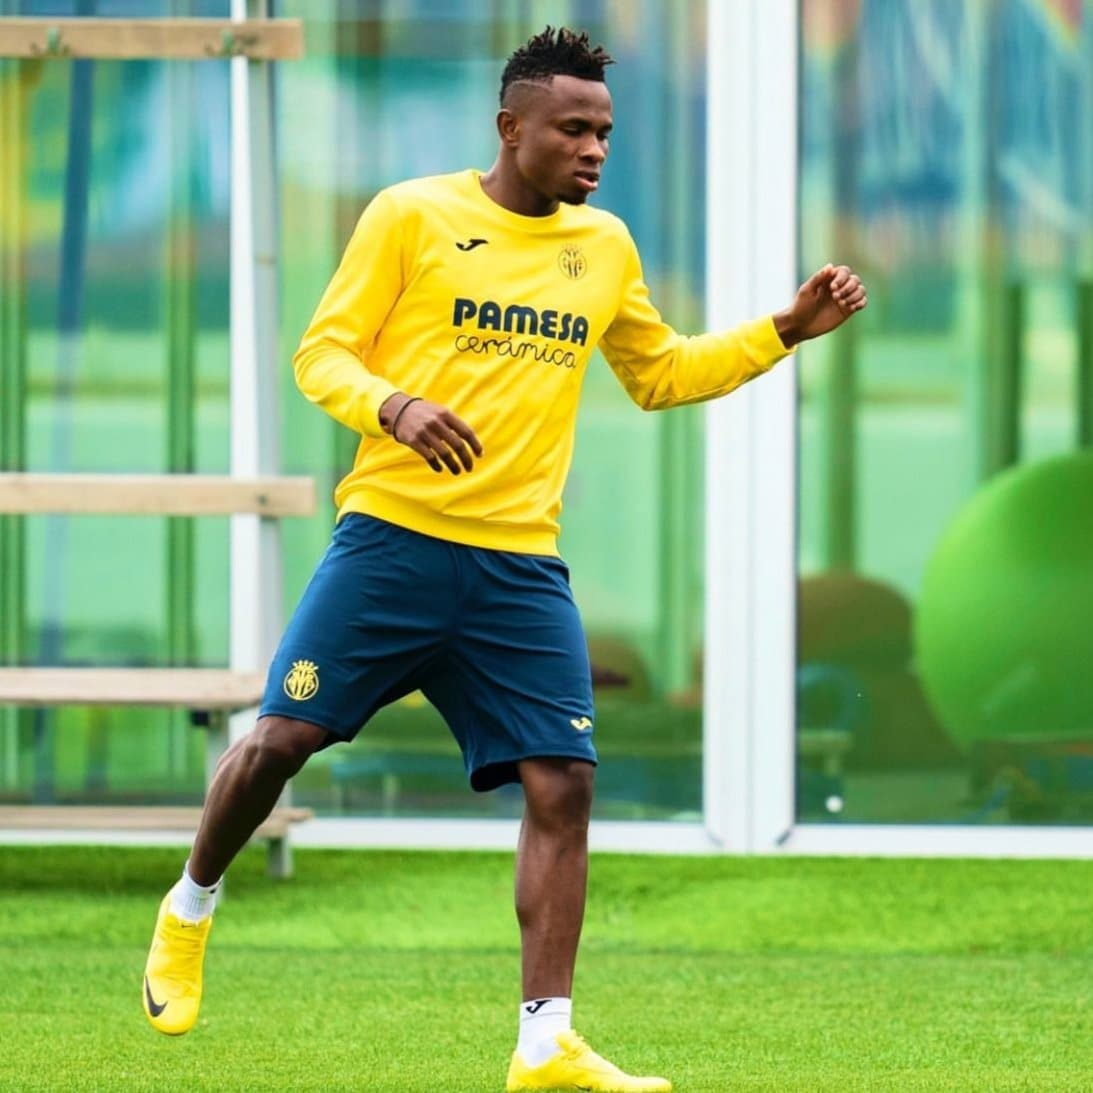 Villarreal Boss Emery Provides Update On Injured Chukwueze